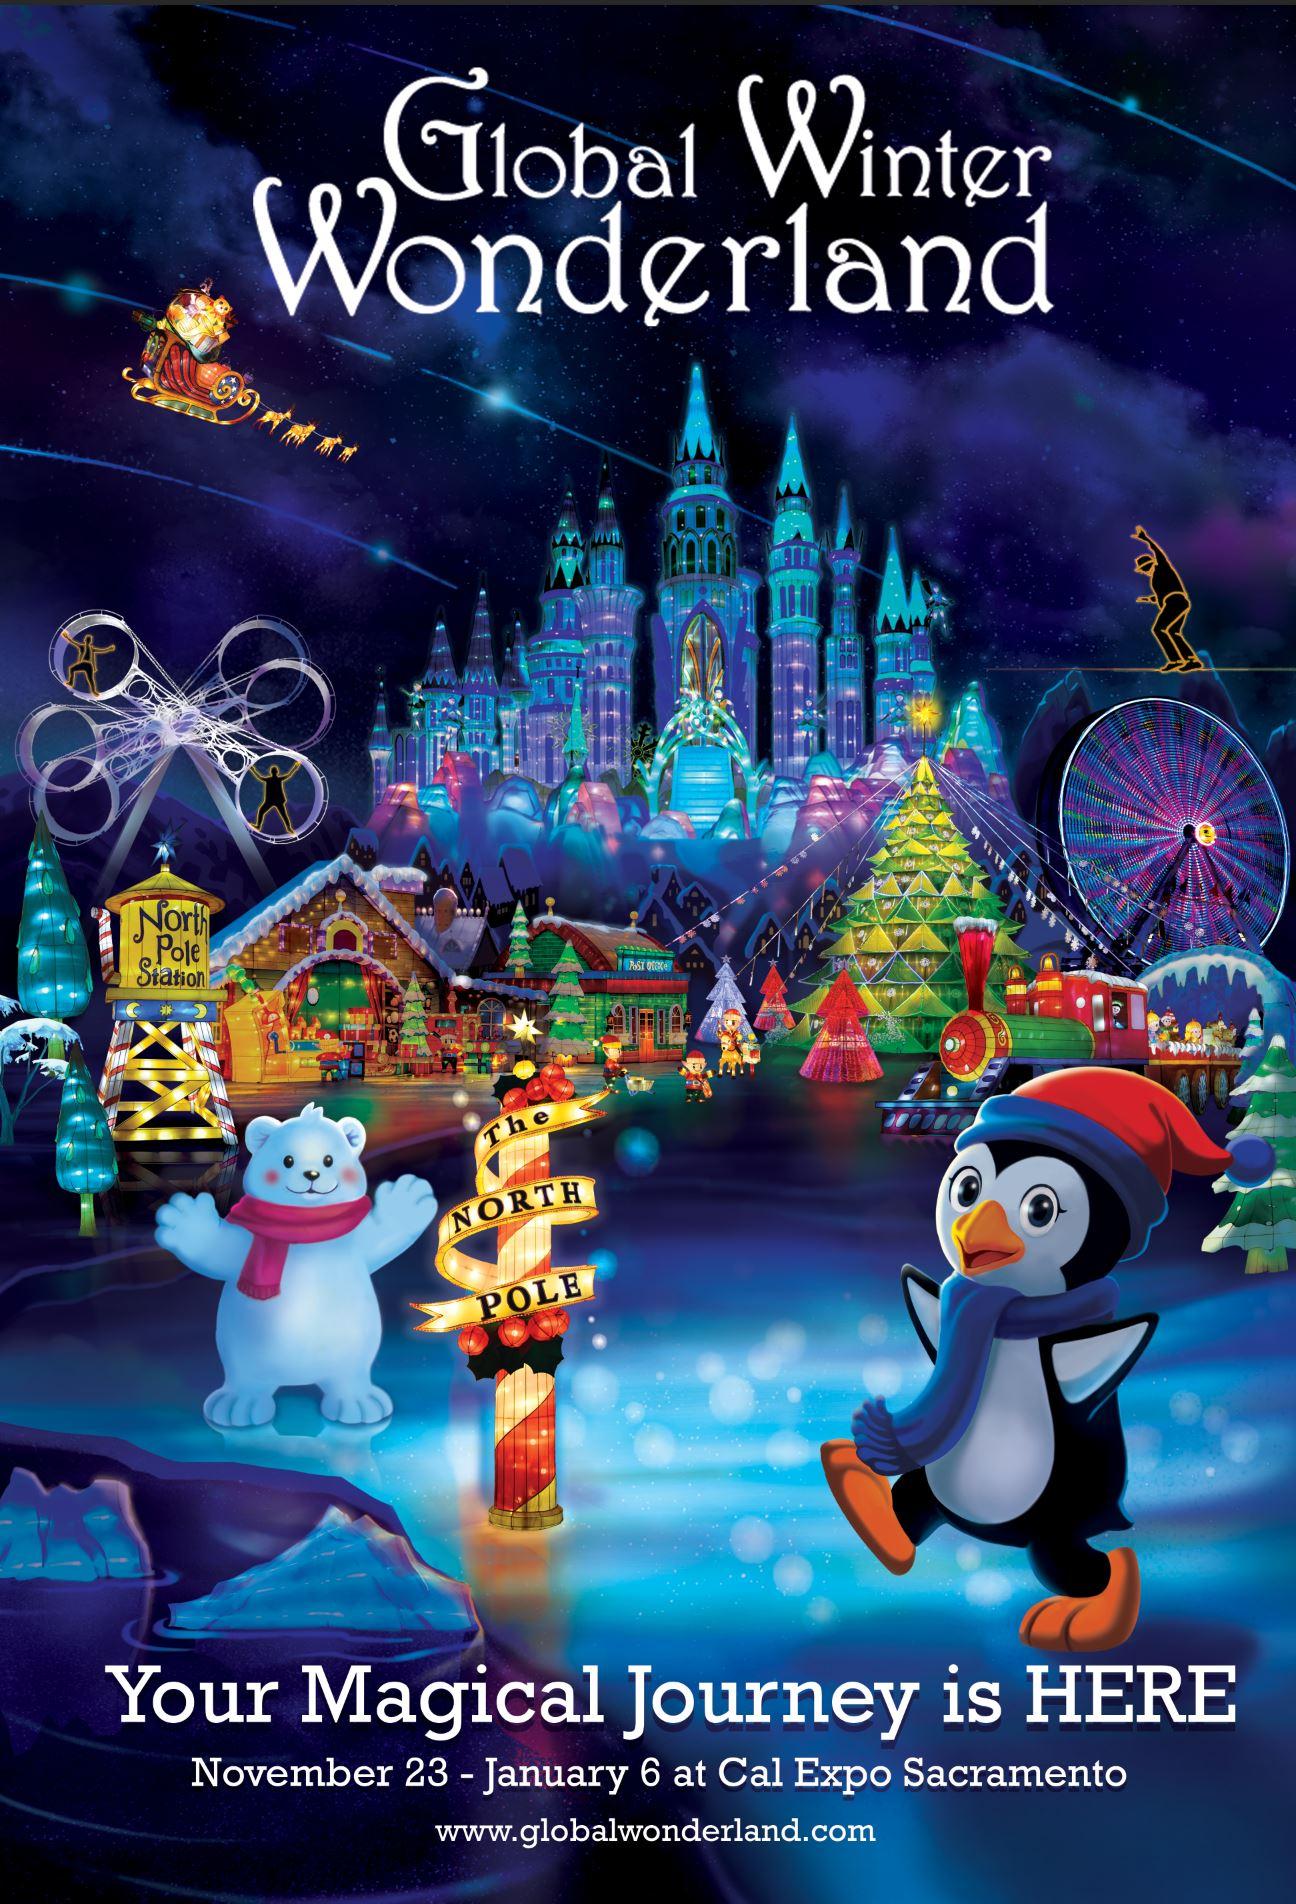 Cal Expo Christmas Lights.Global Winter Wonderland 2018 Presented By International